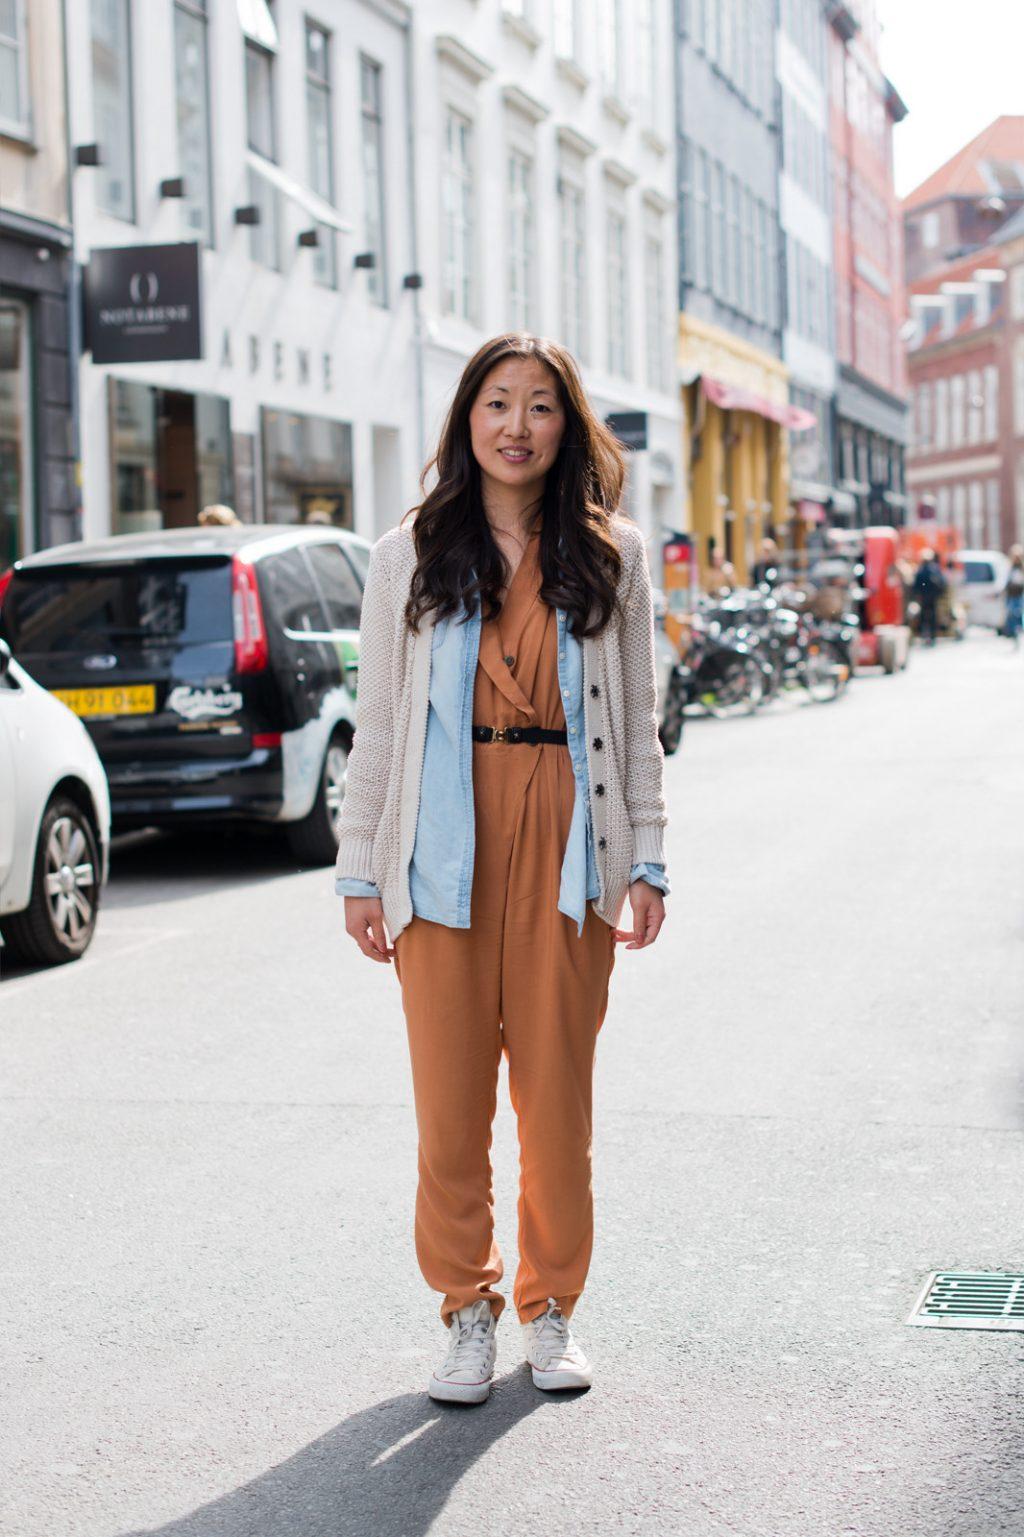 thời trang phụ nữ tuổi 30 14